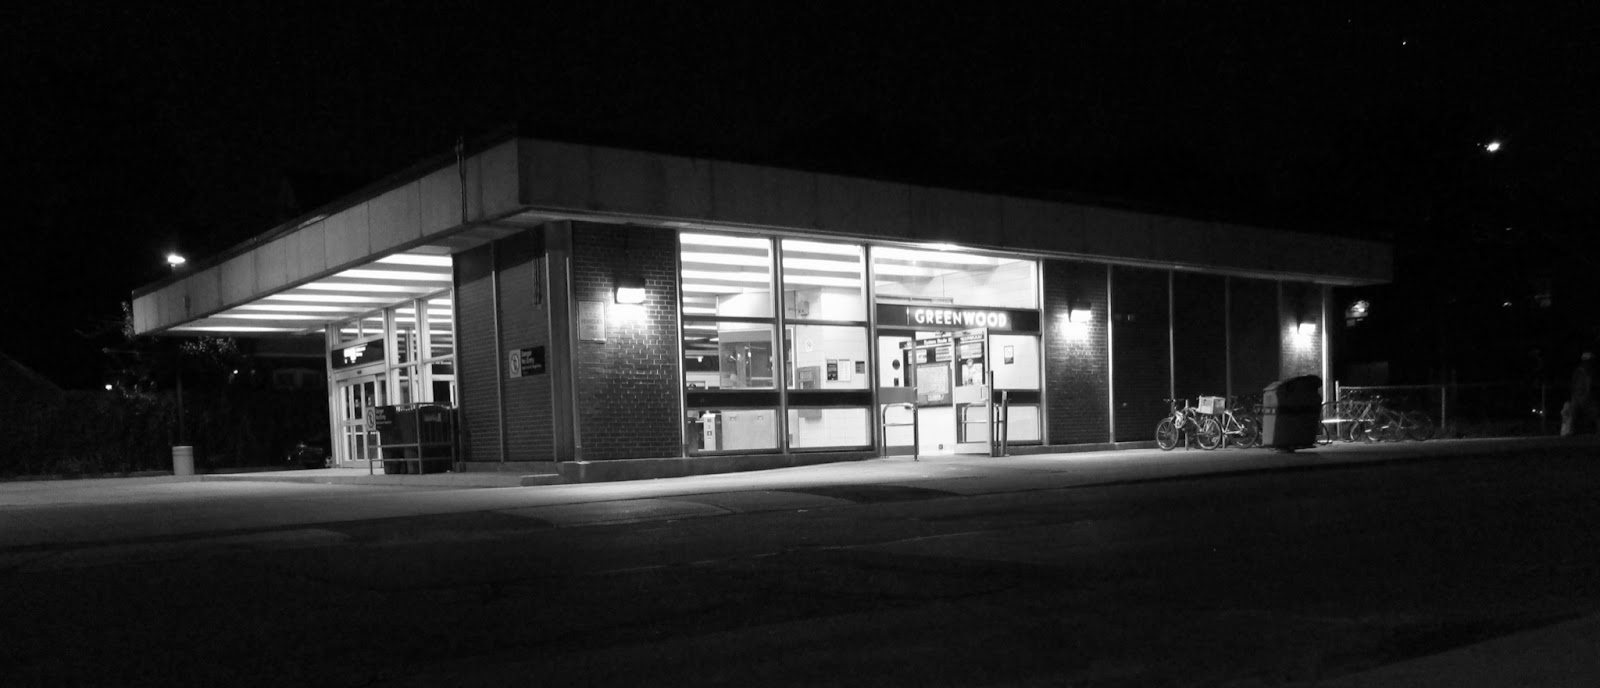 Greenwood station exterior